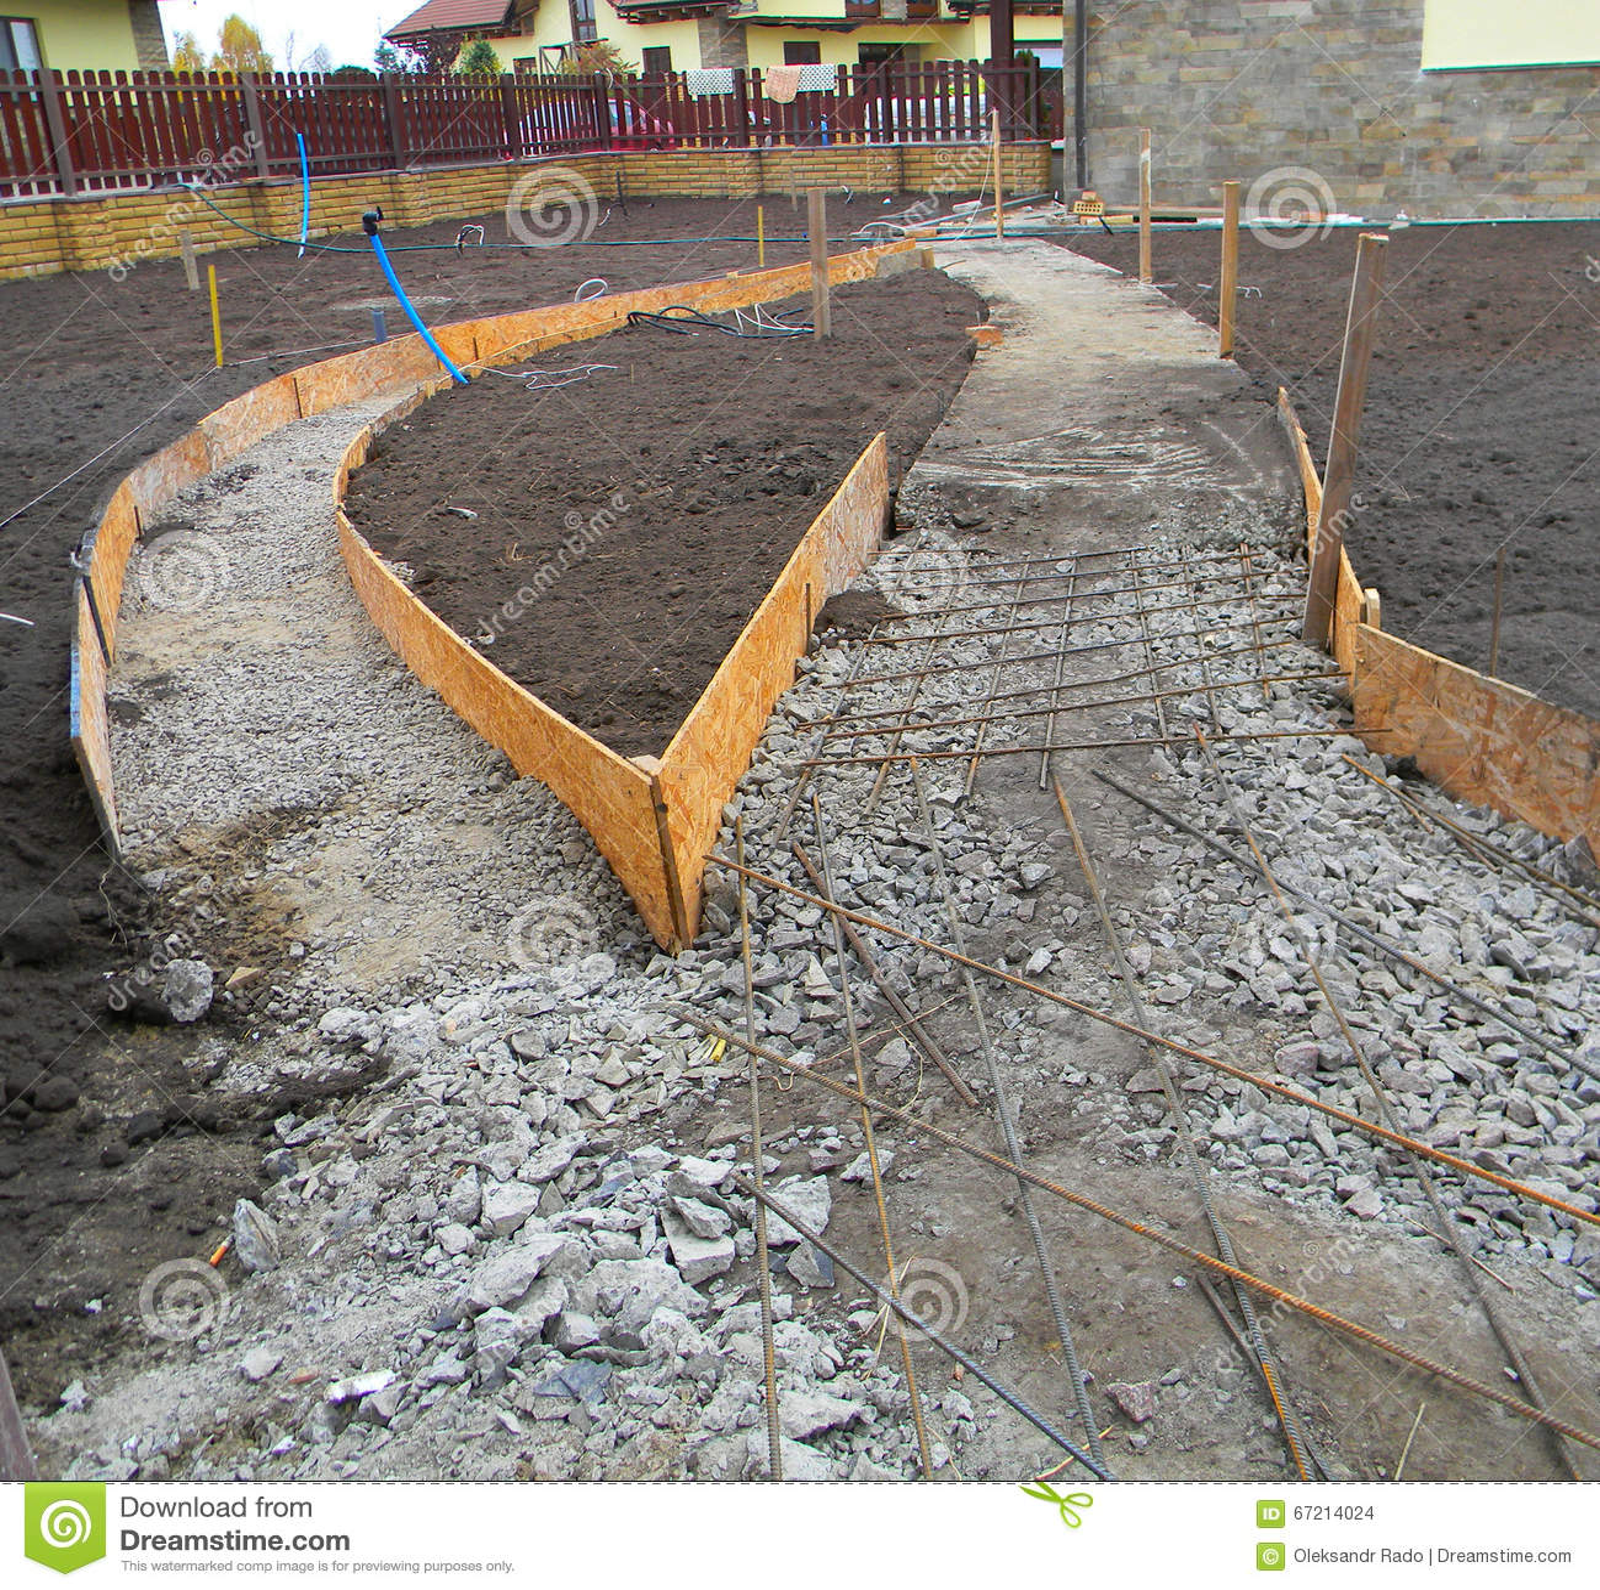 nuevo pavimento concreto el jardn fundacin para pavimentar foto de archivo